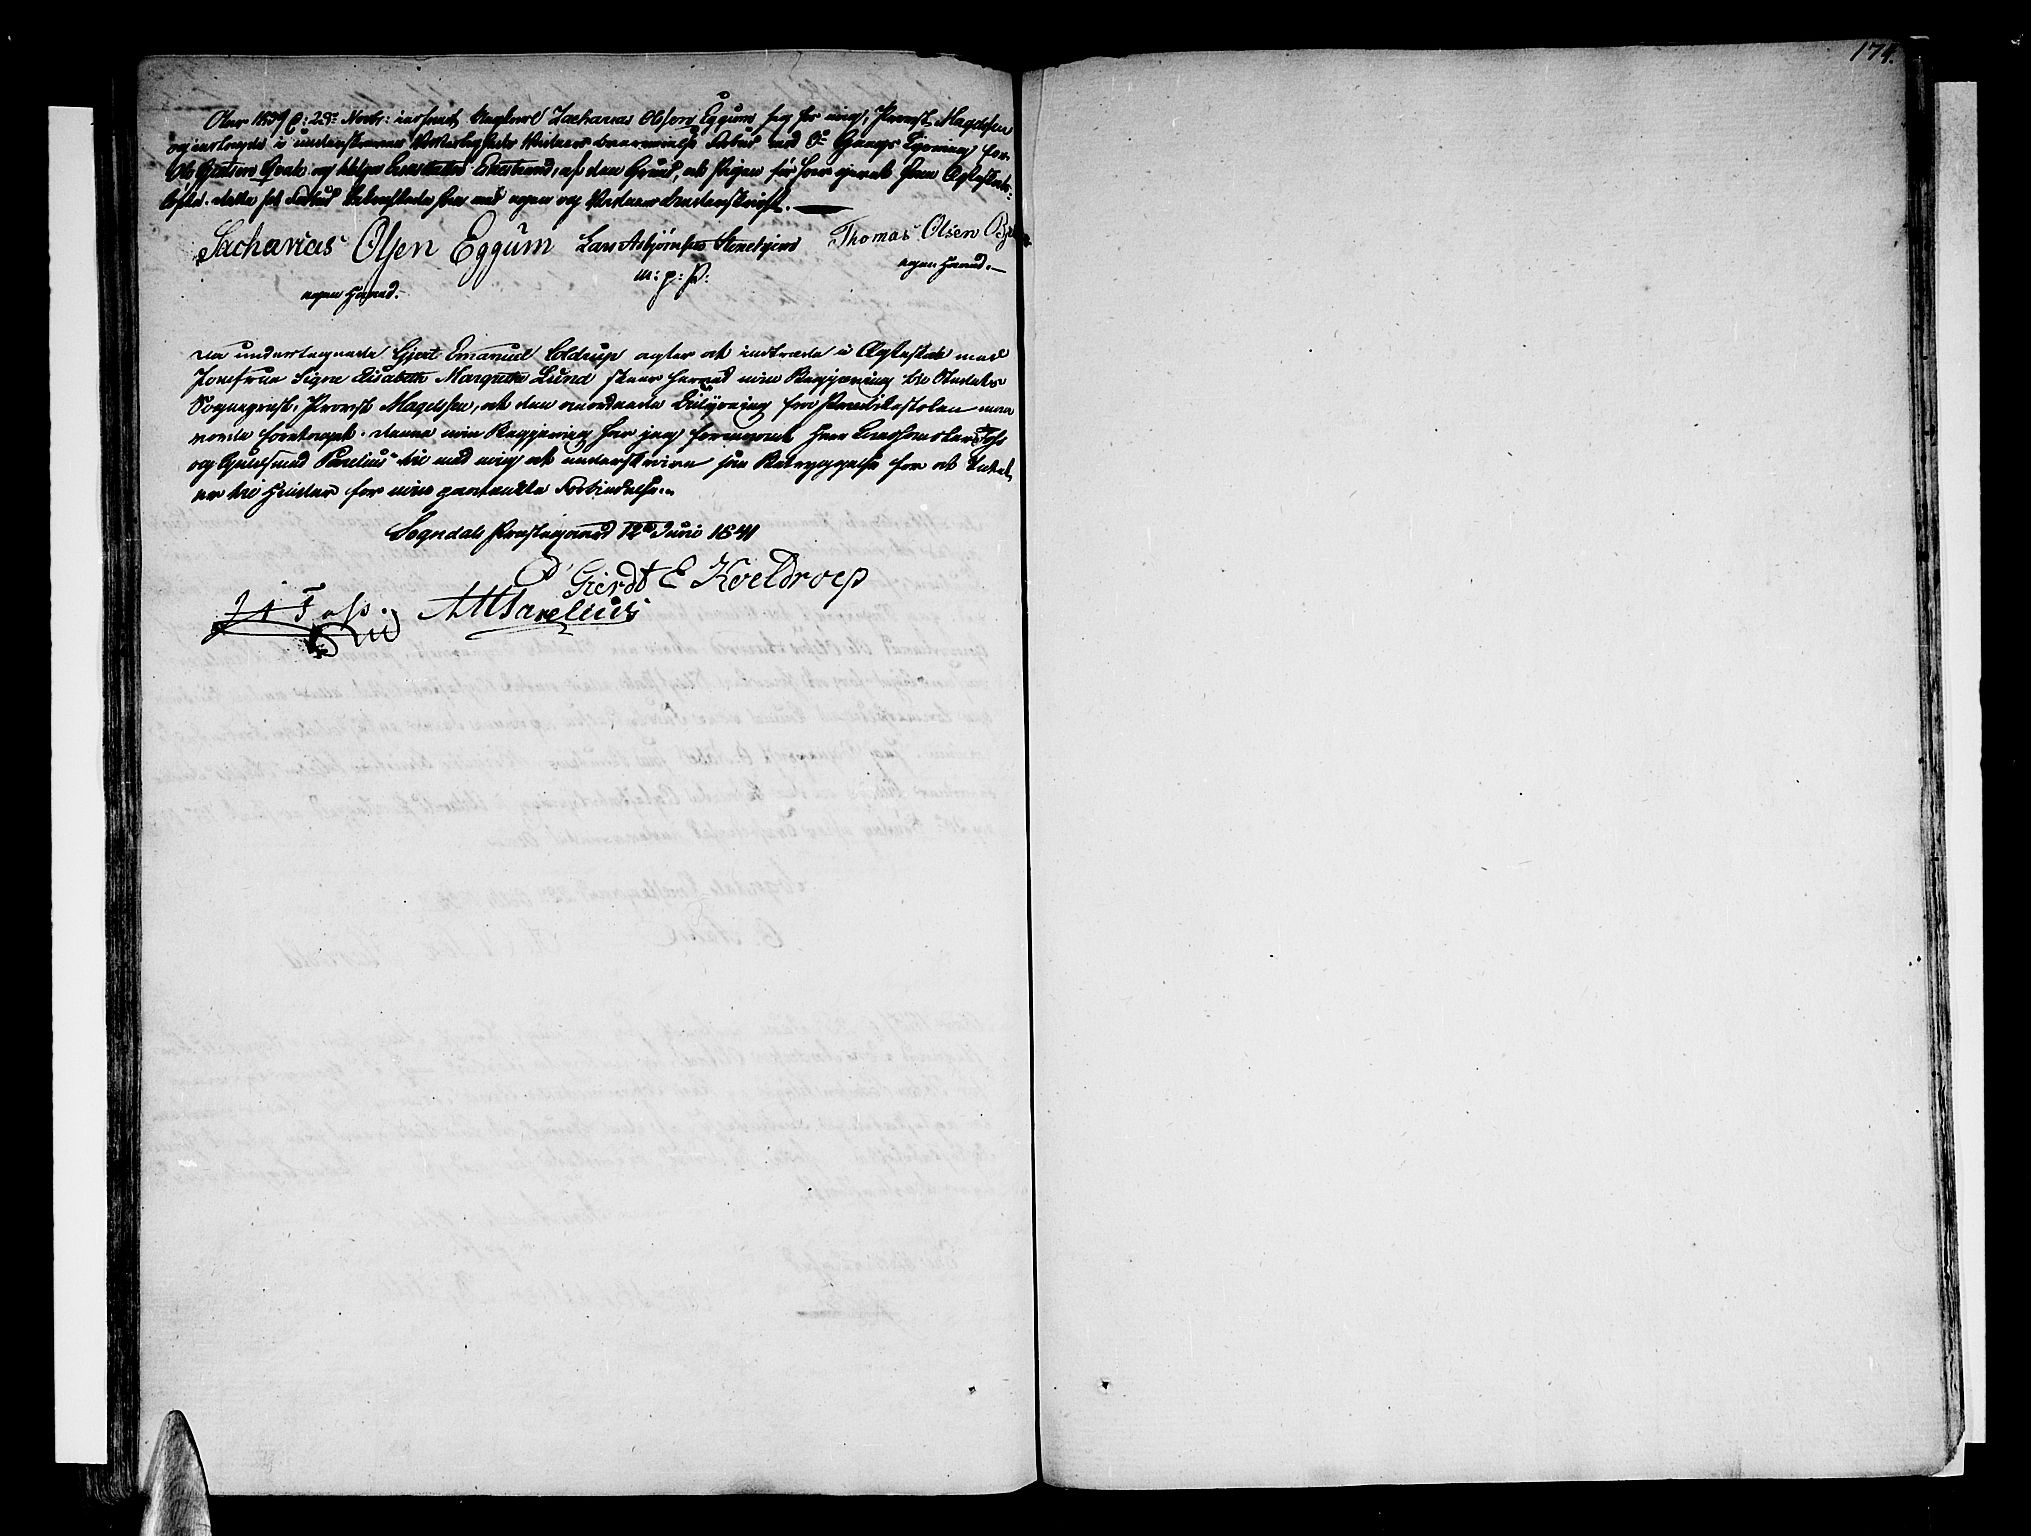 SAB, Sogndal sokneprestembete, H/Haa/Haaa/L0009: Ministerialbok nr. A 9, 1809-1821, s. 174